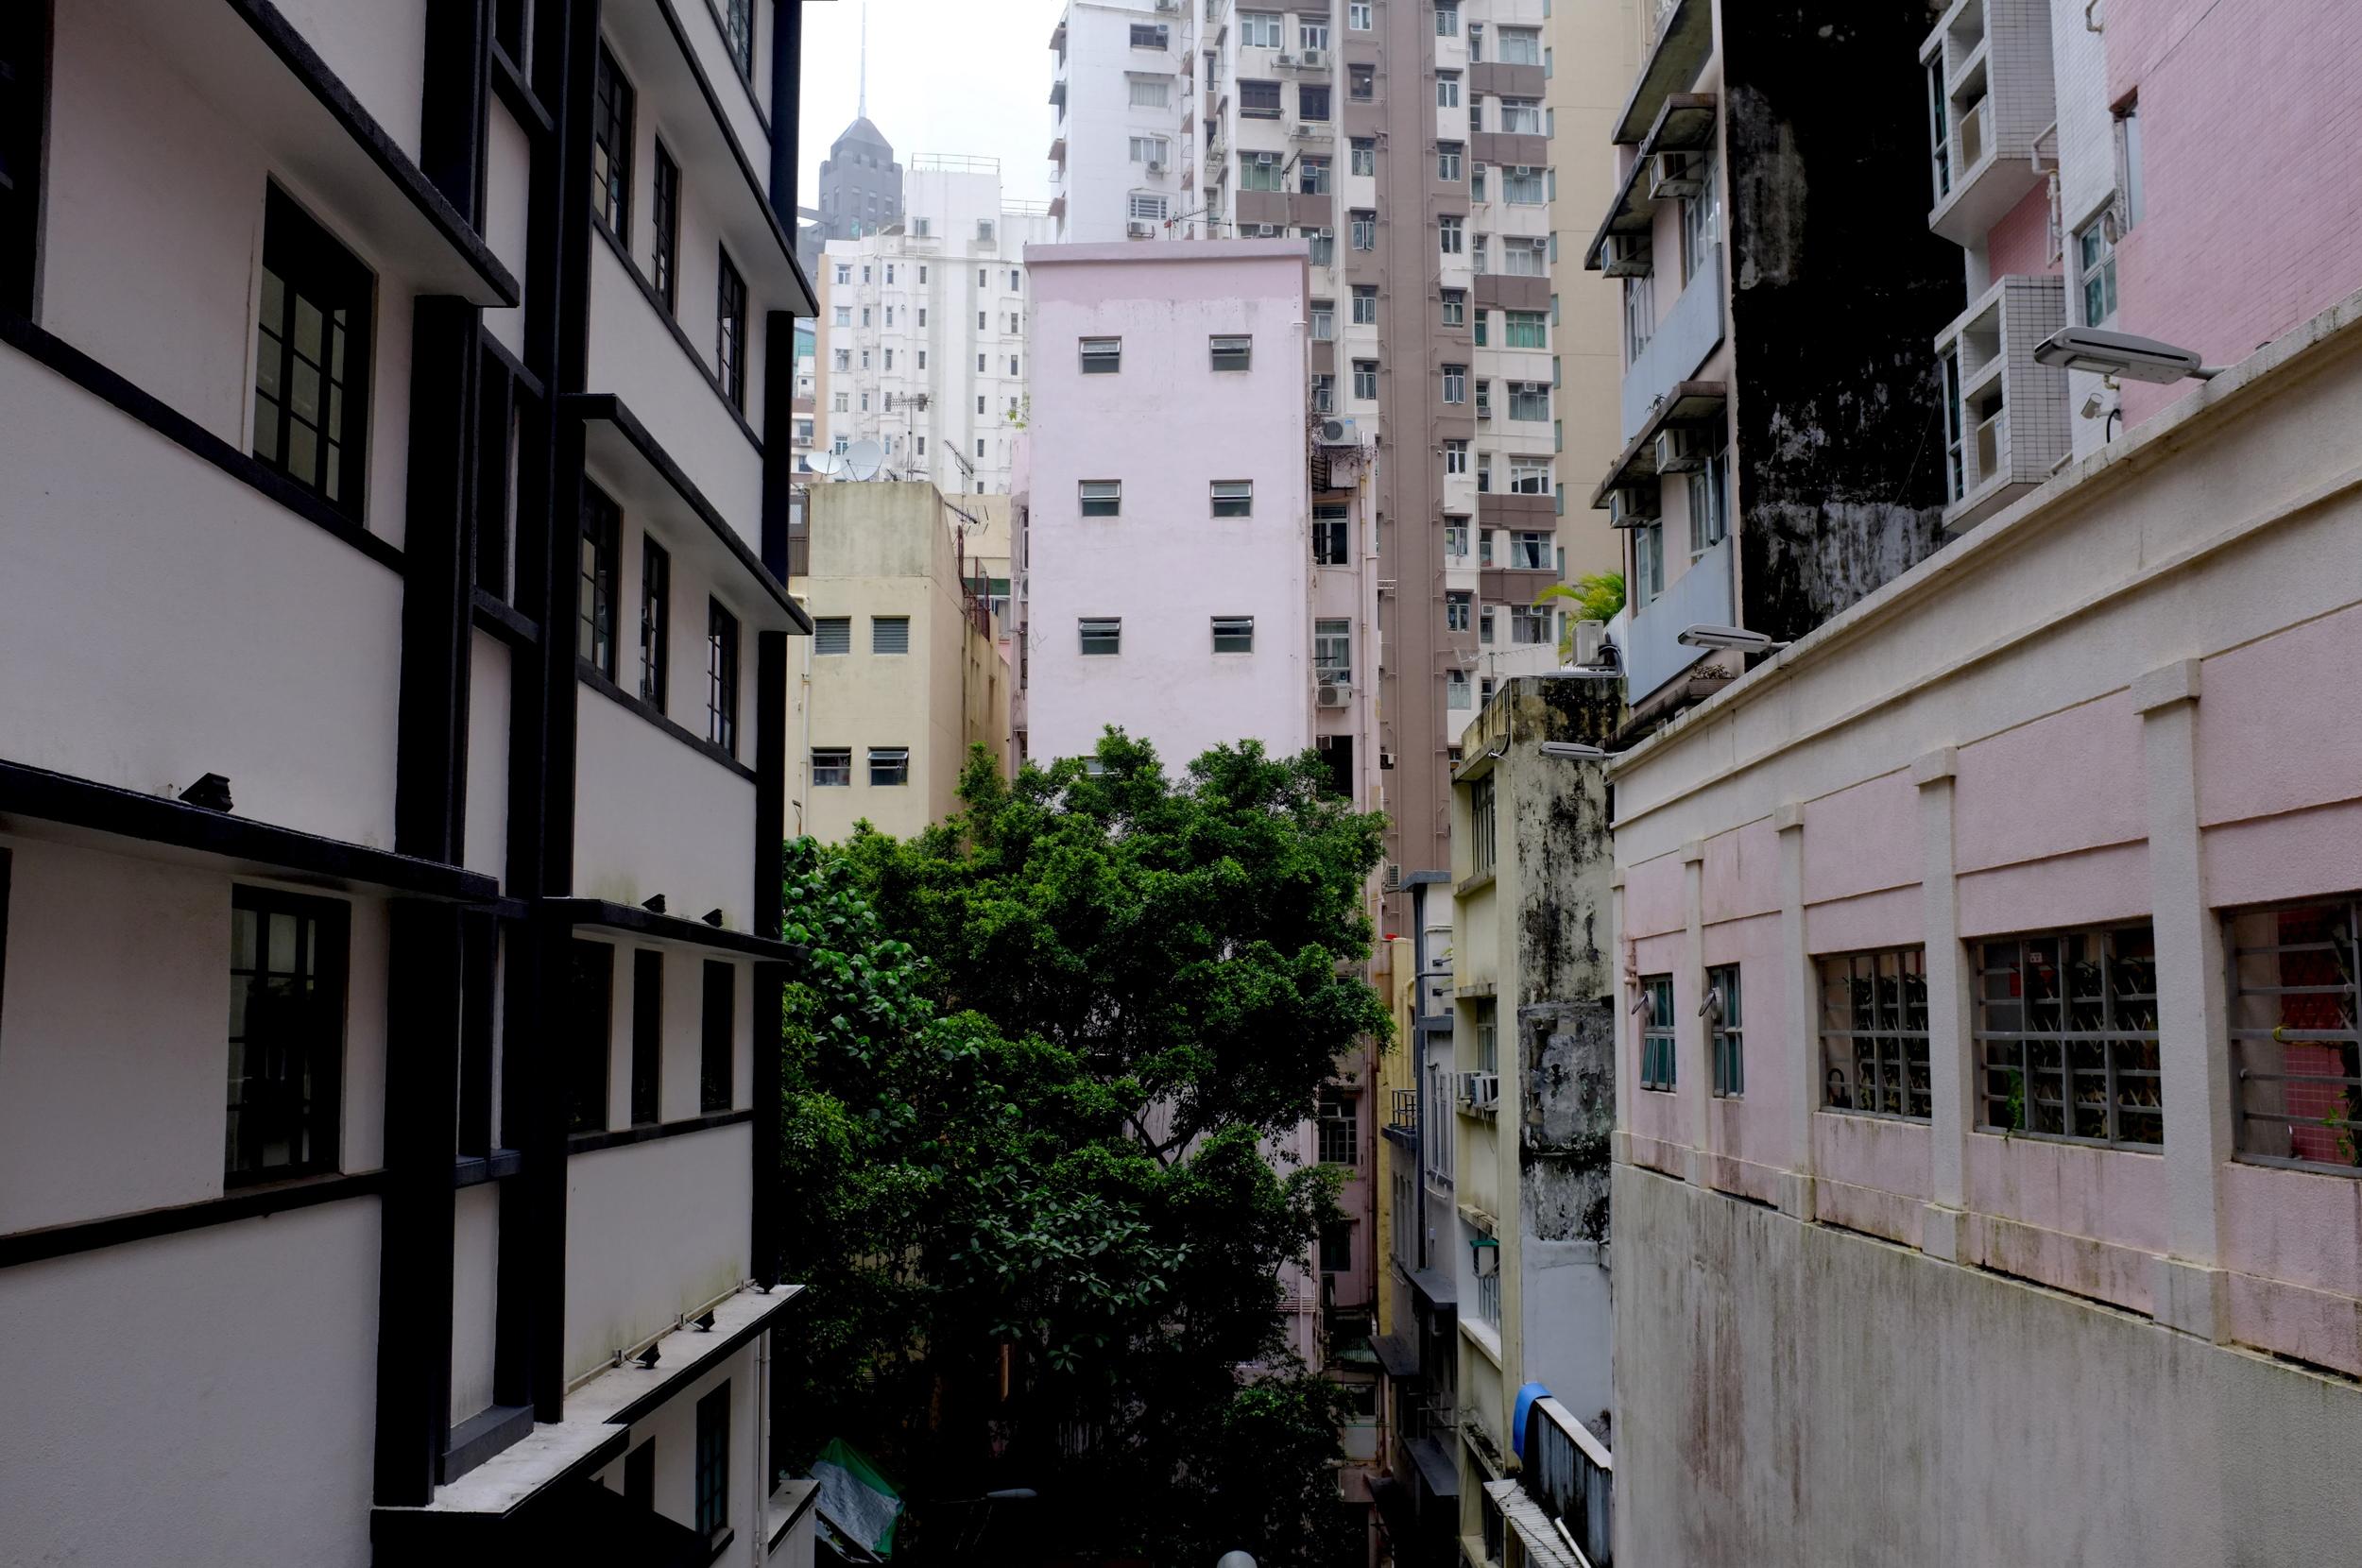 Apartment buildings in Wan Chai